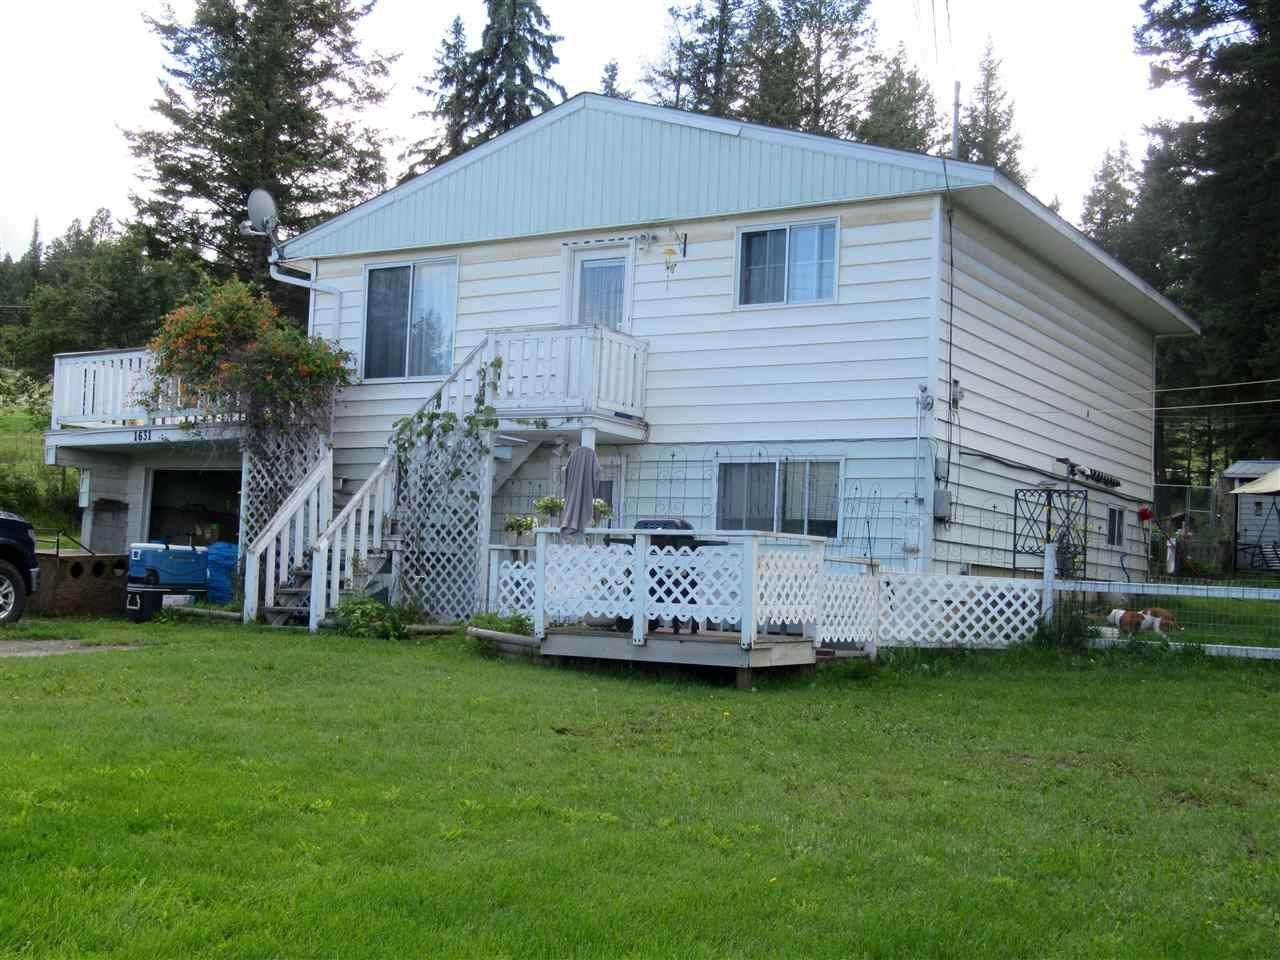 Main Photo: 1631 DOG CREEK Road in Williams Lake: Esler/Dog Creek House for sale (Williams Lake (Zone 27))  : MLS®# R2390079